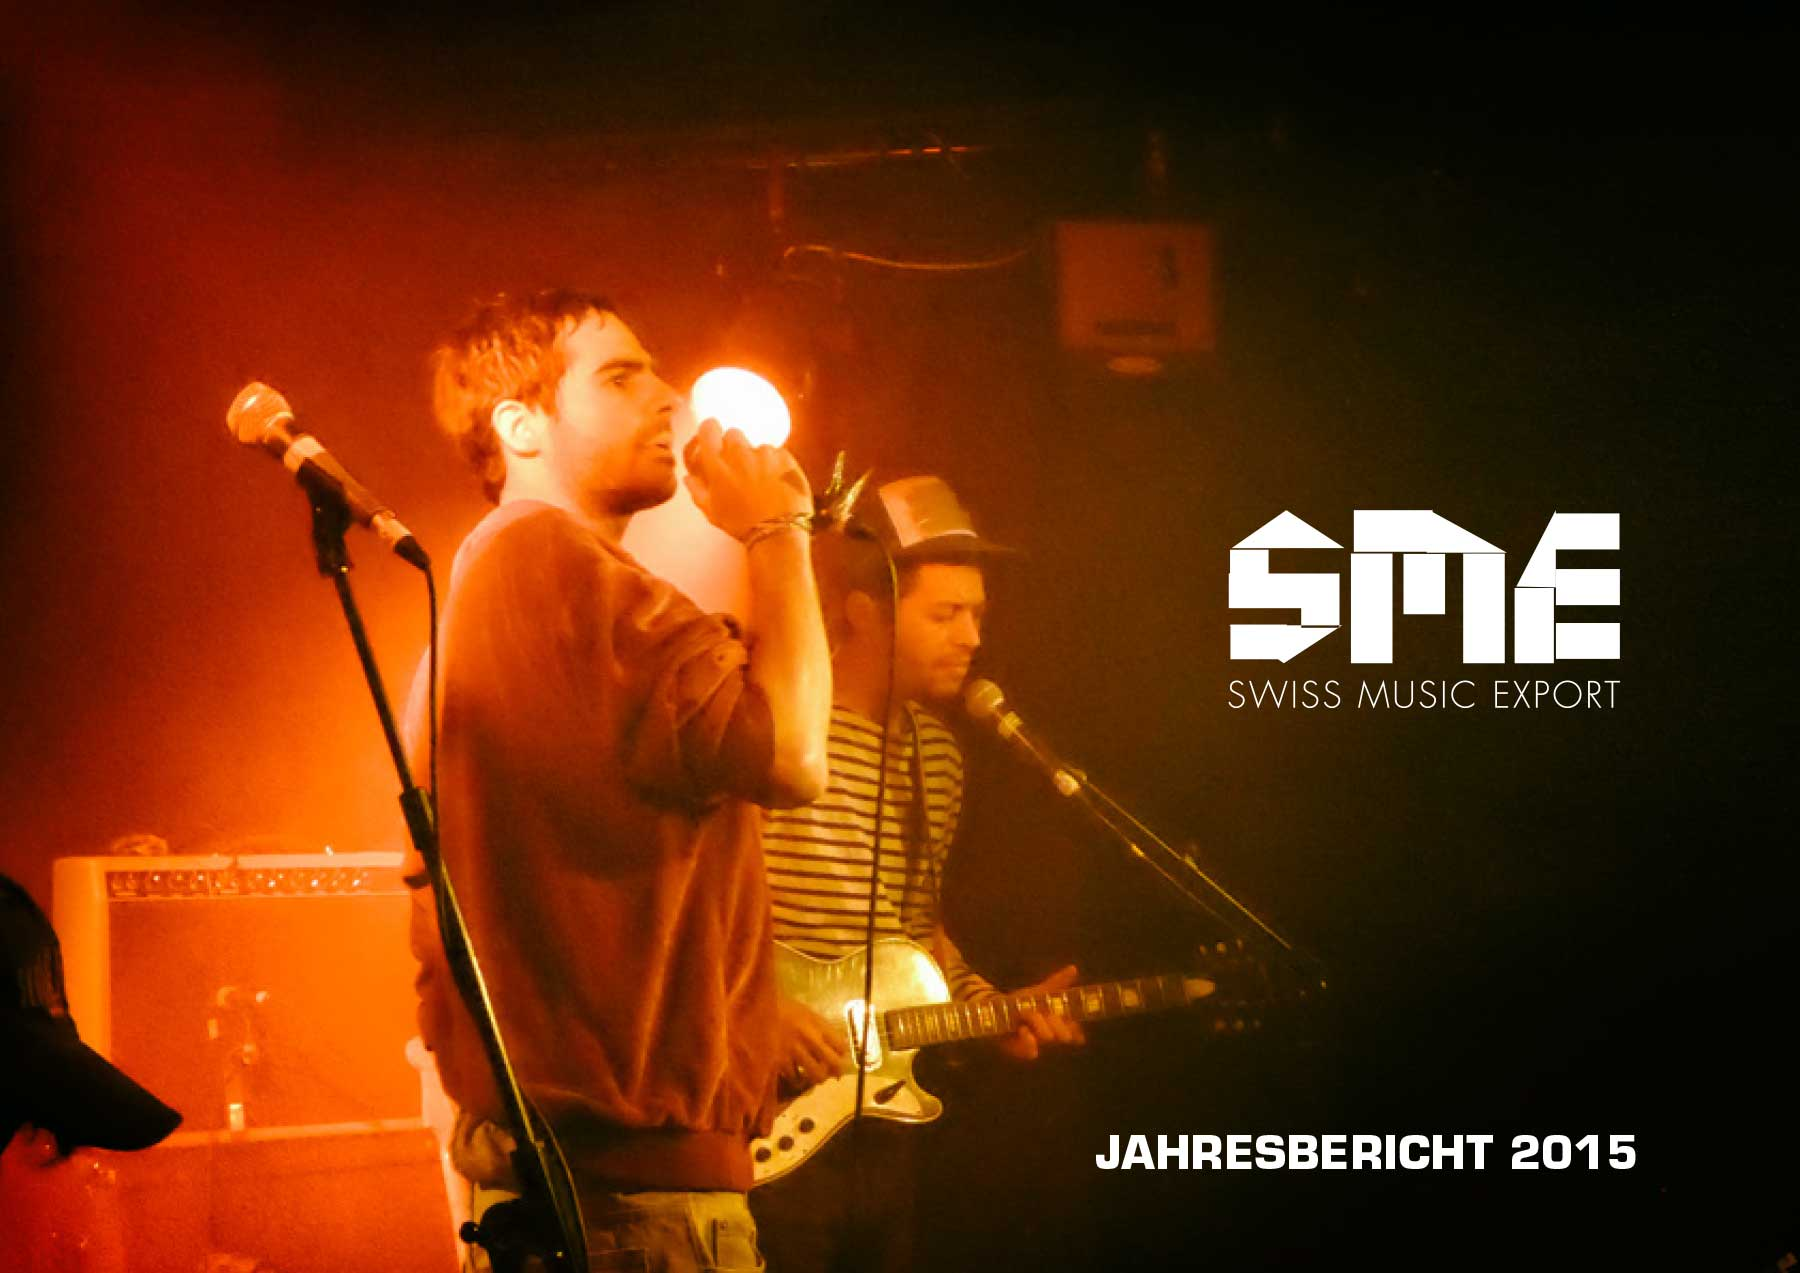 Swiss Music Export – Jahresbericht